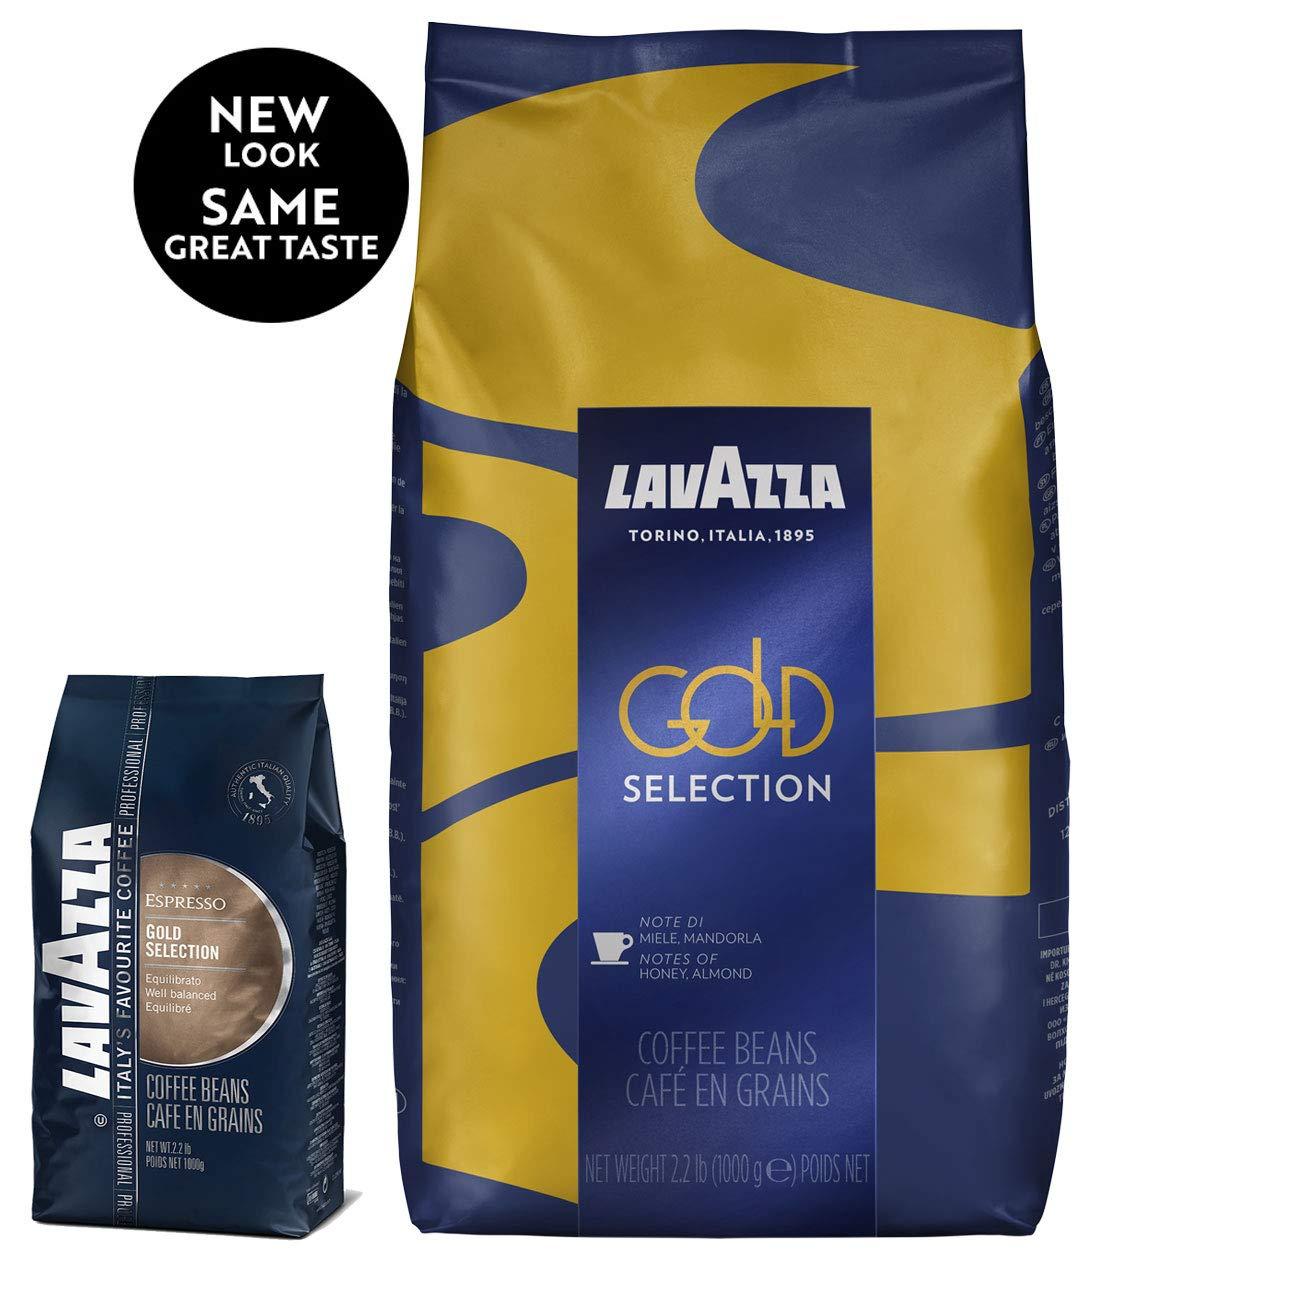 Lavazza Gold Selection Whole Bean Coffee Blend, Medium Espresso Roast, 2.2-Pound Bag by Lavazza